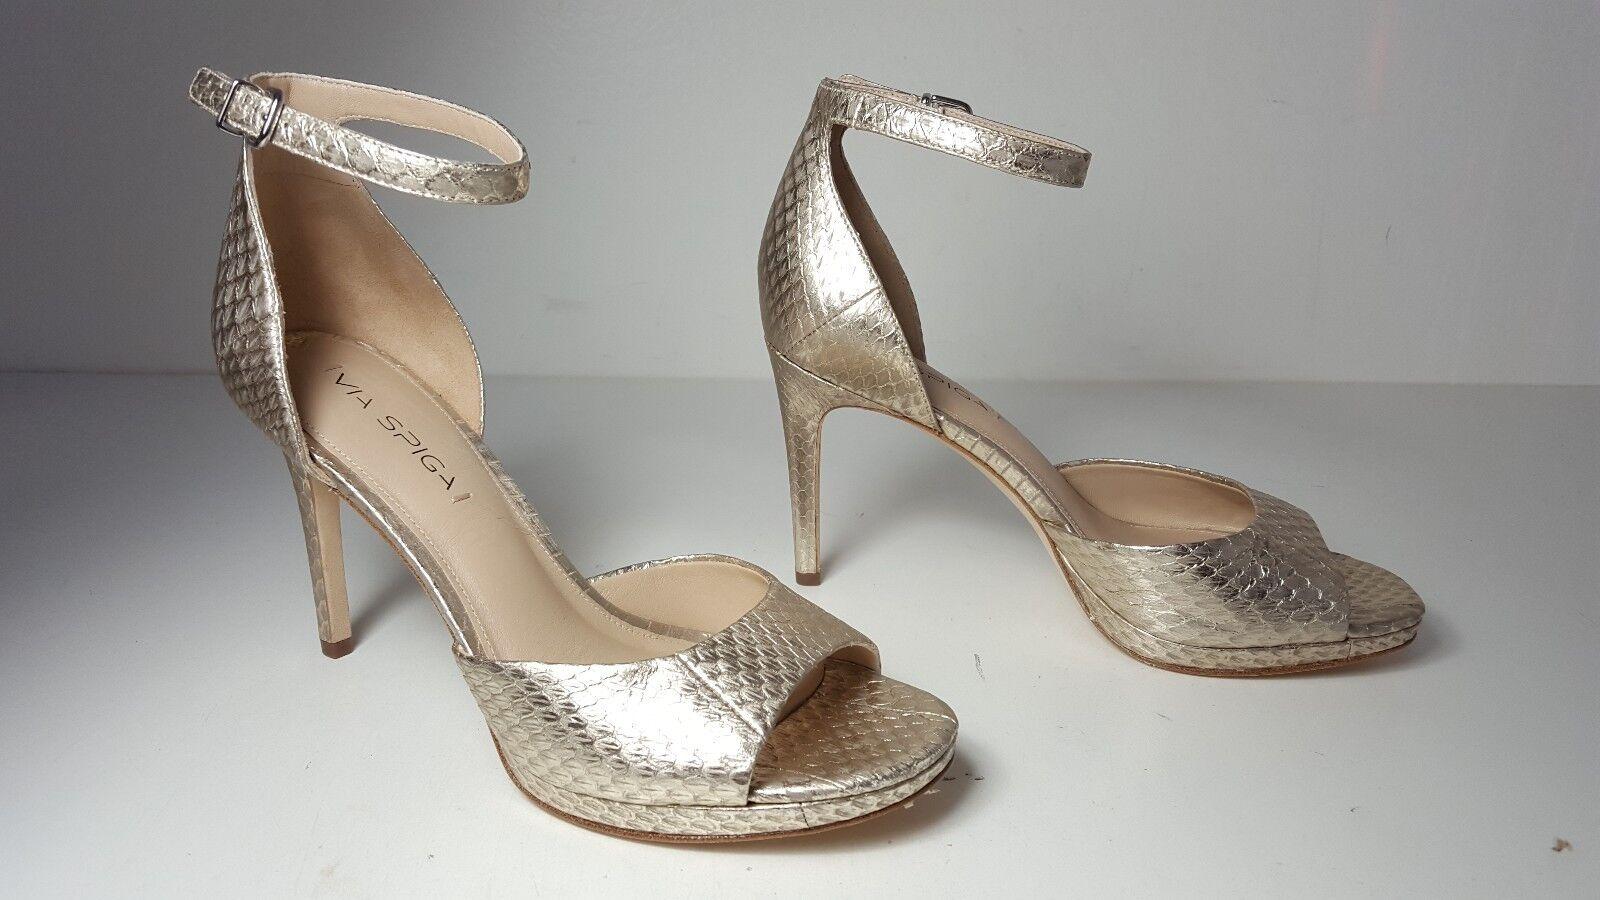 225 Größe 8 Via Spiga Salina Platinum Leder Heel Ankle Strap Sandales Schuhes NEU